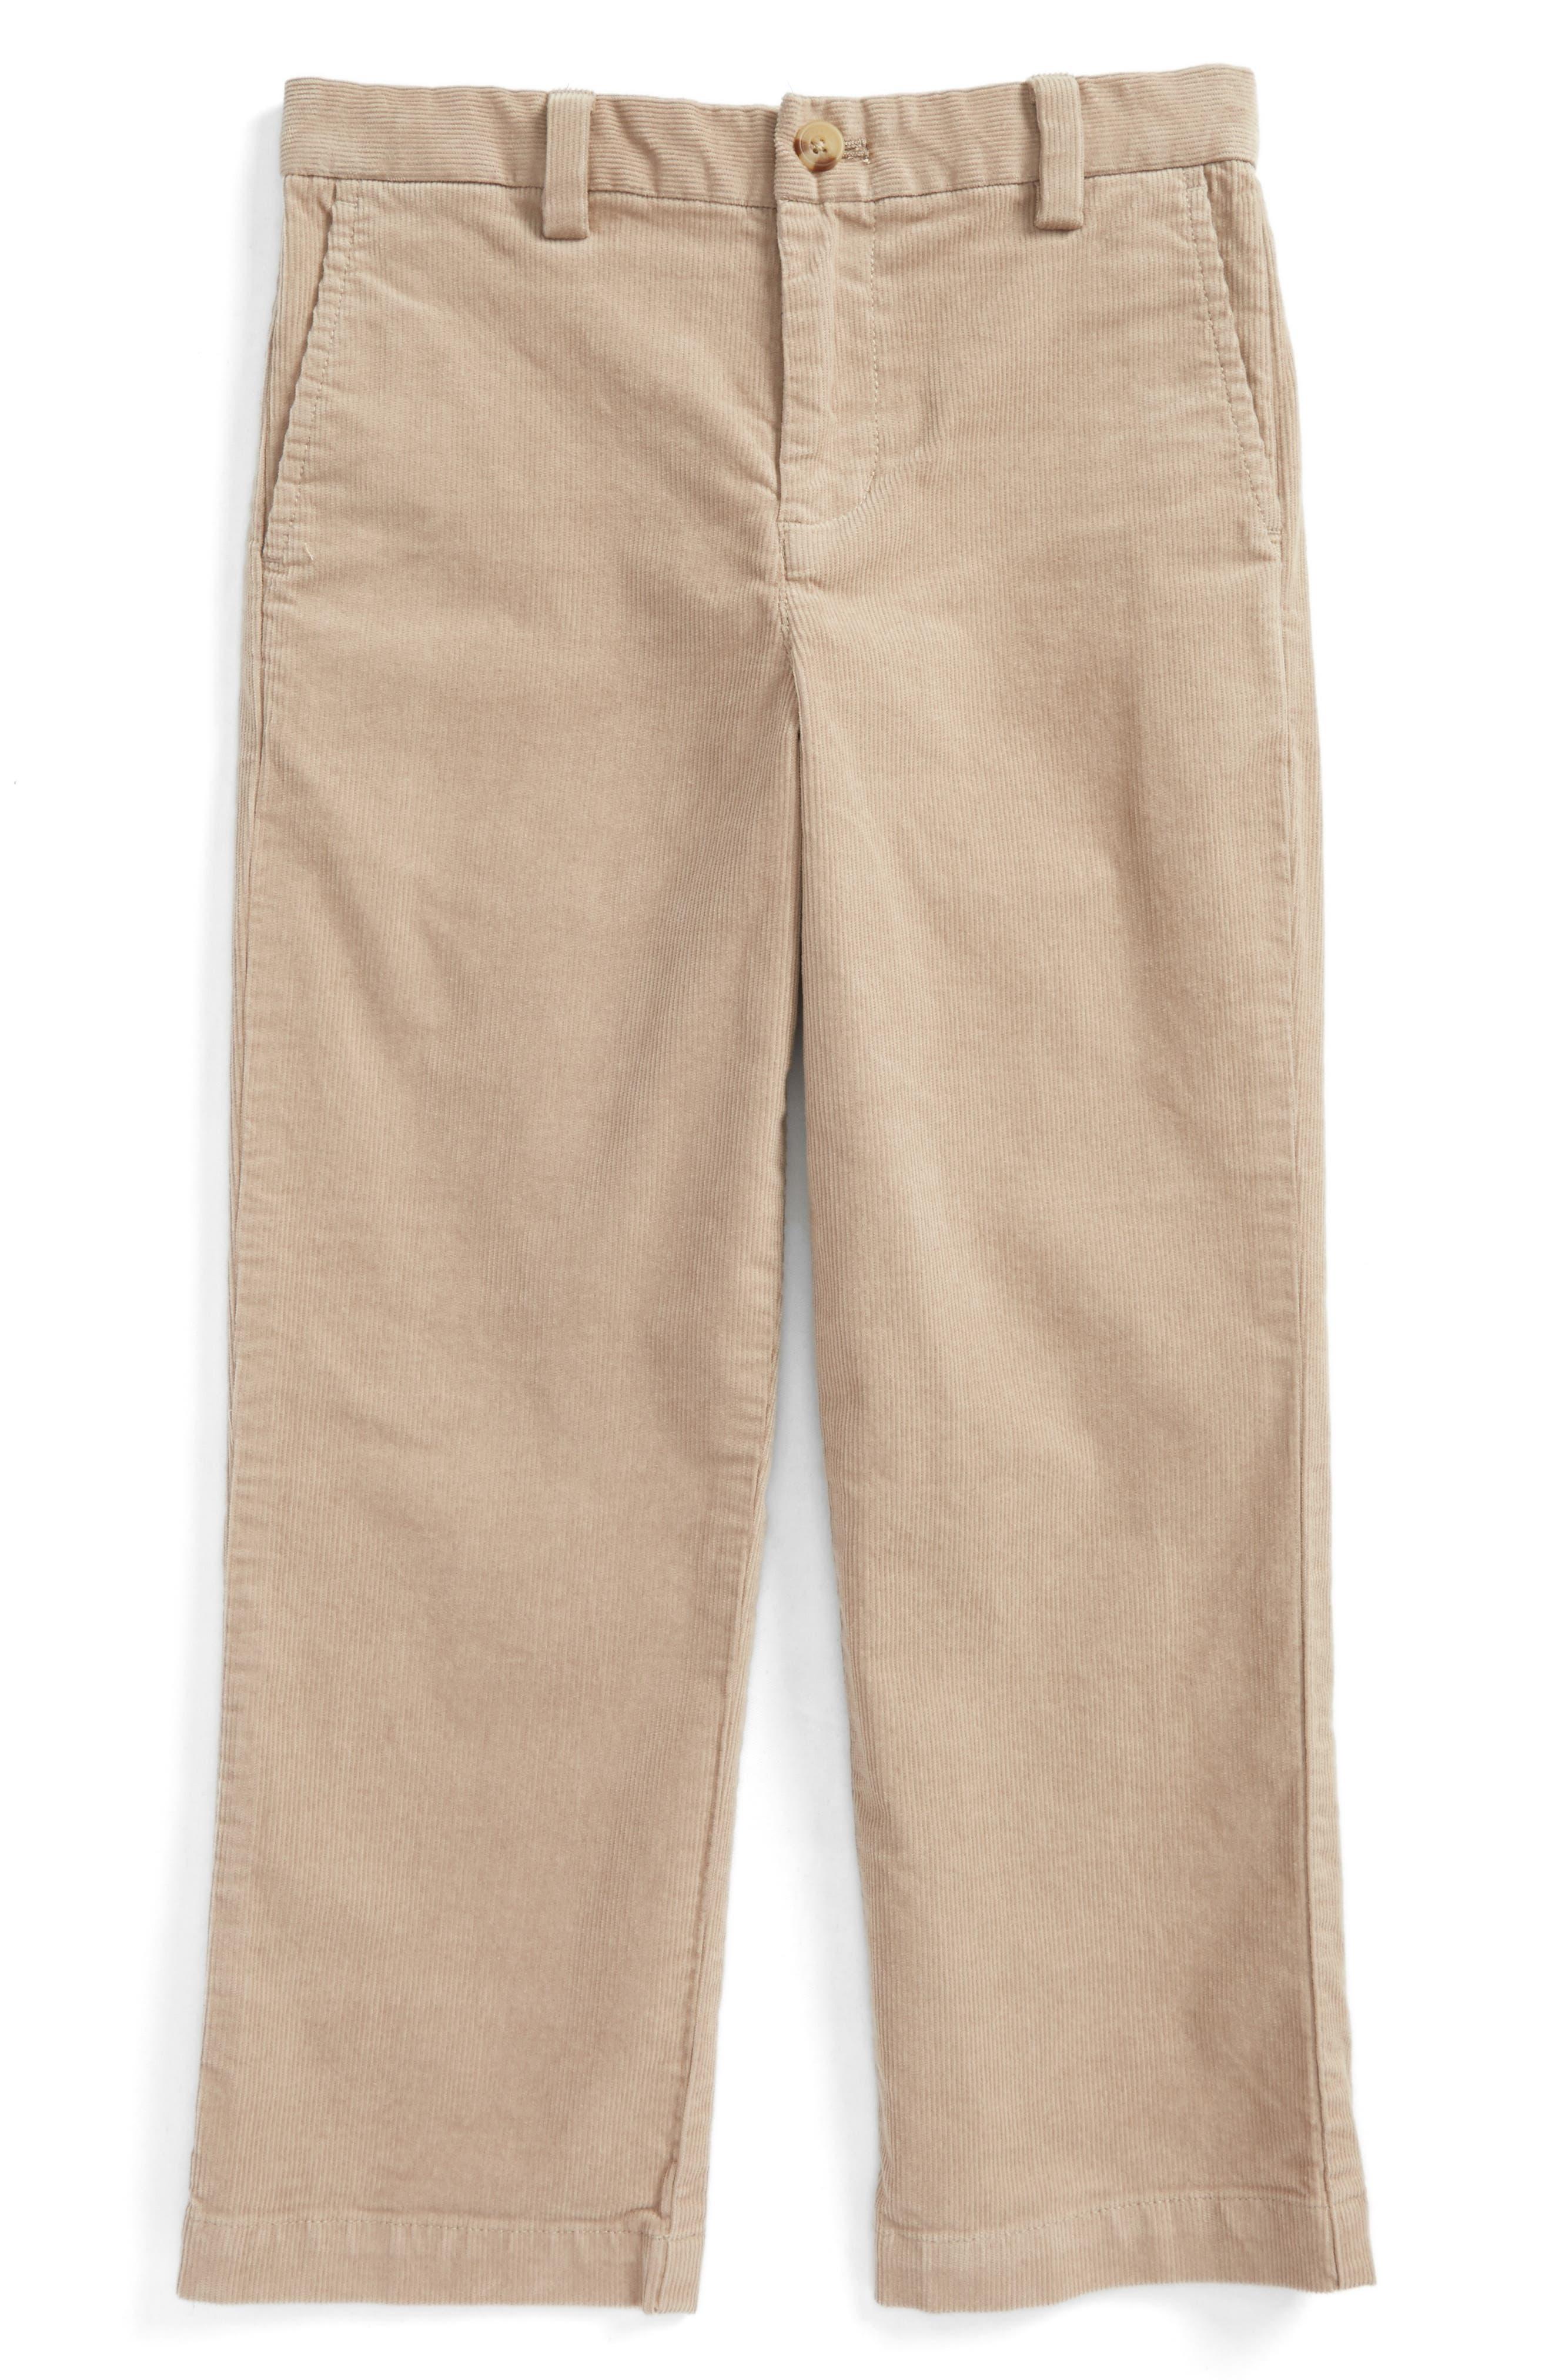 Breaker Corduroy Pants,                             Main thumbnail 1, color,                             250